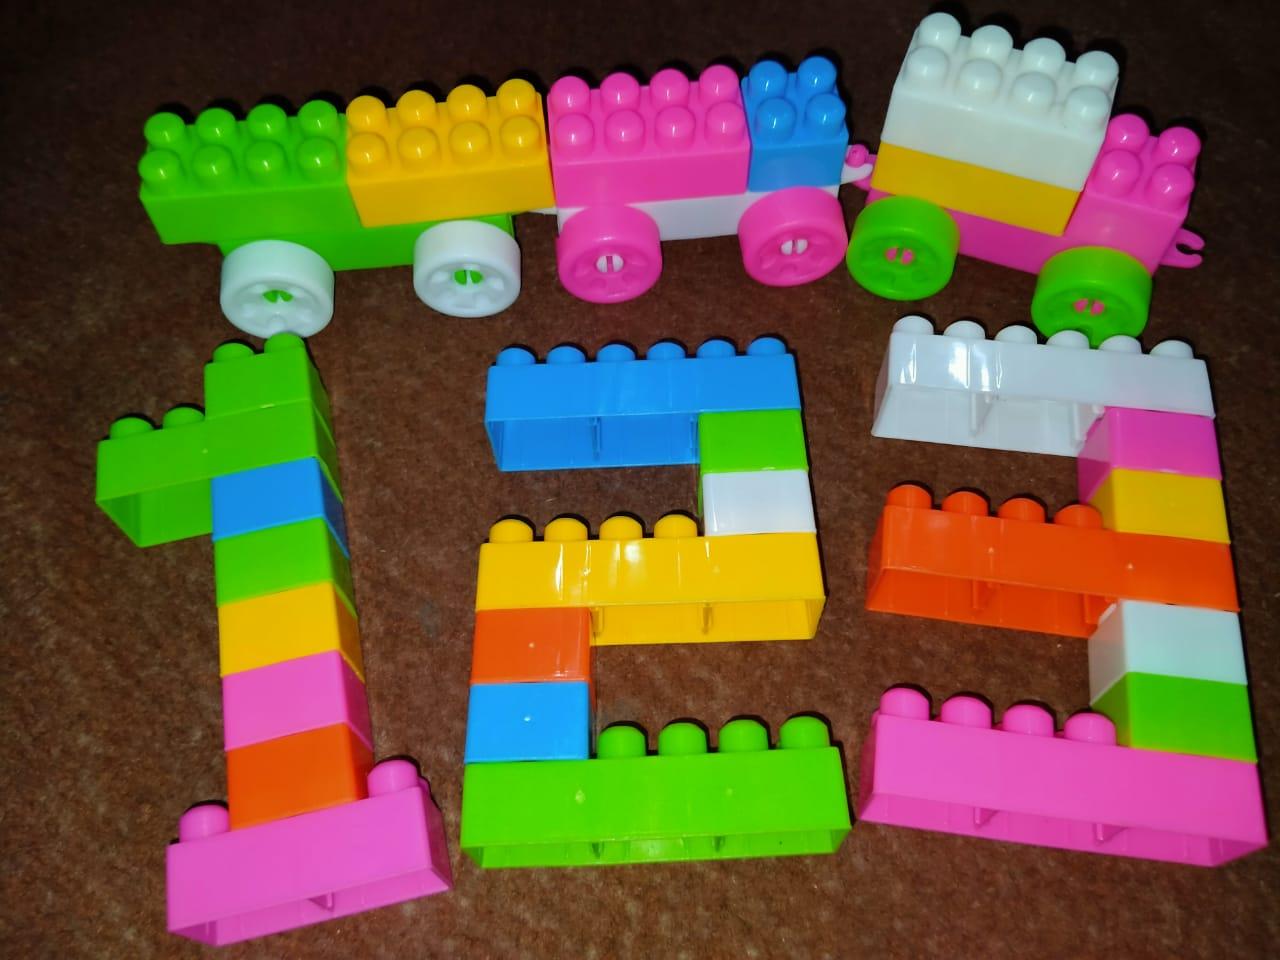 Building Blocks Set for Kids Imported Hi Quality Educational toy set Original Set 51 Pieces